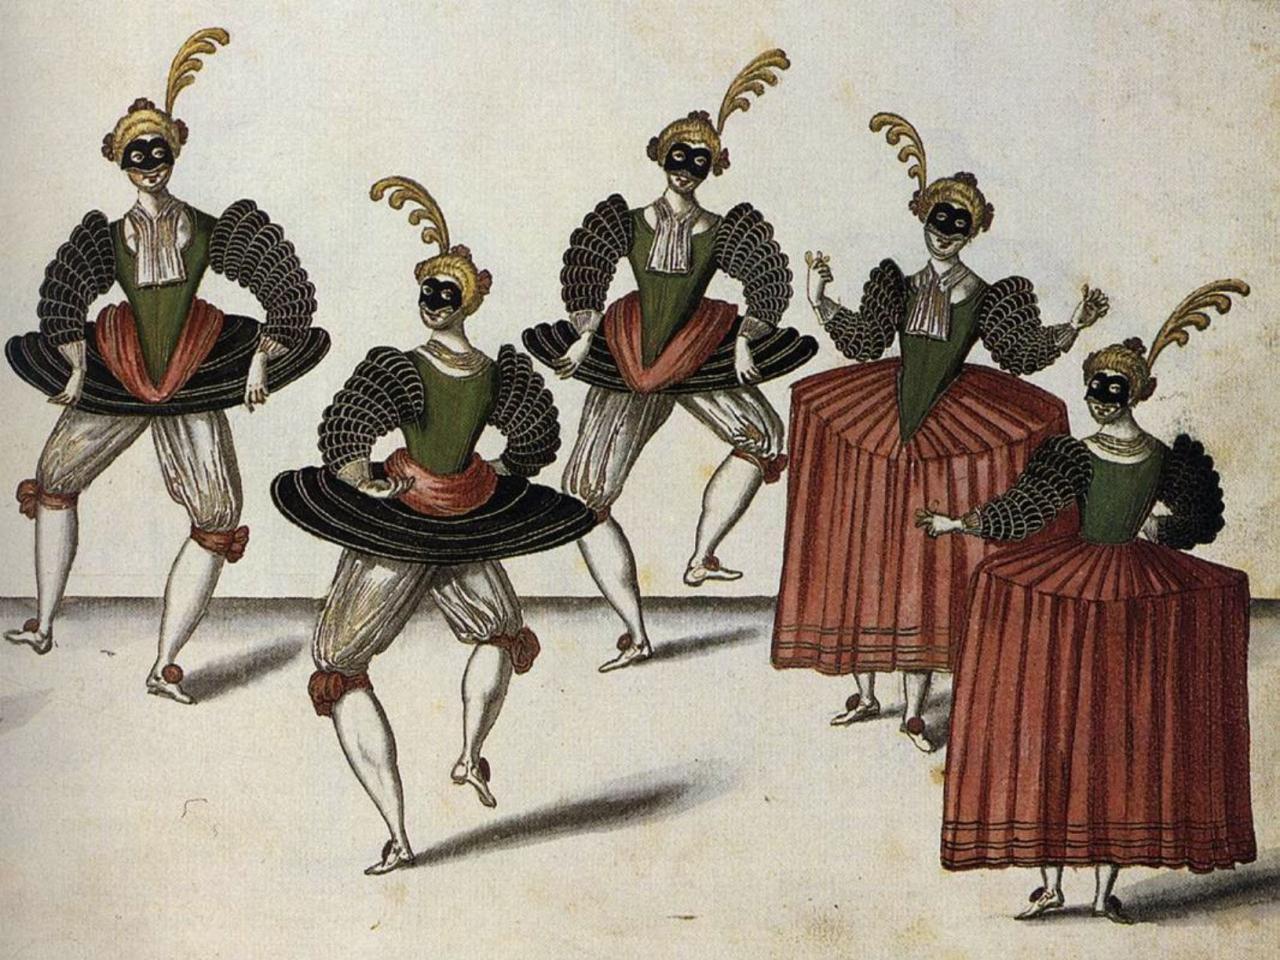 Cinq danseurs en grande tenue de ballet